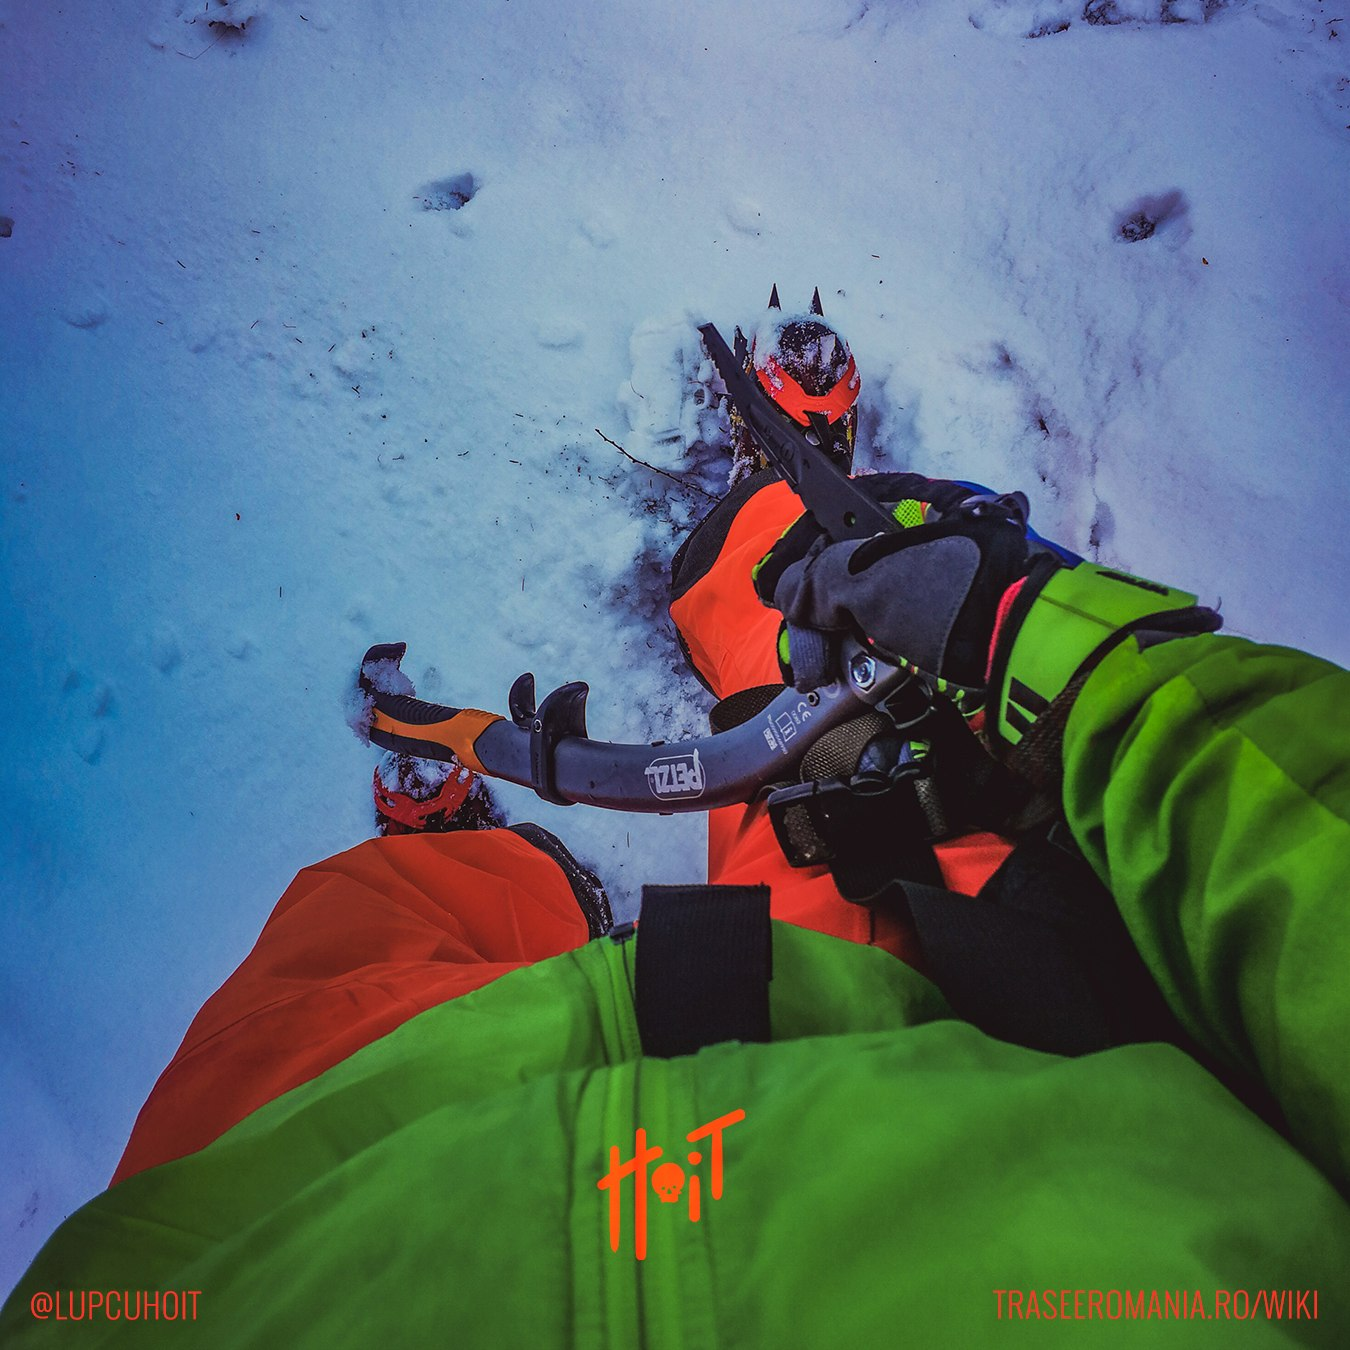 Echipament alpinism de iarna